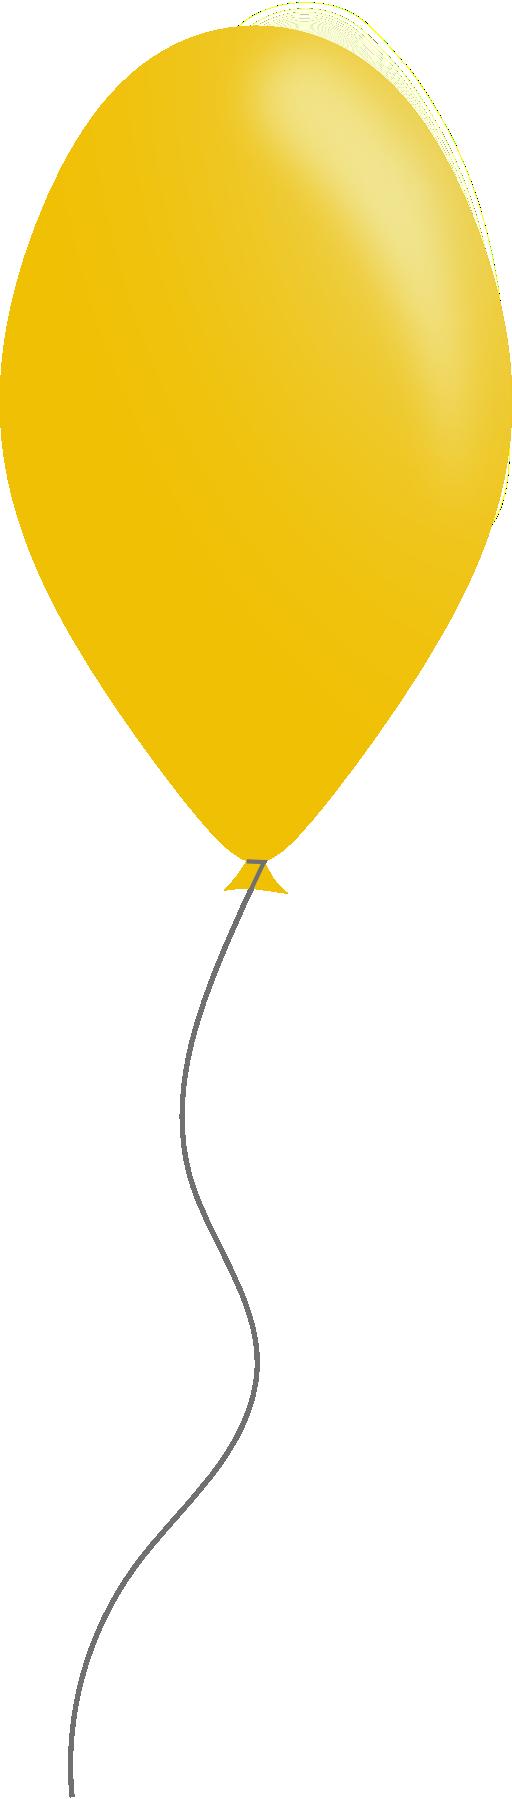 Phone clipart yellow. Balloon i royalty free